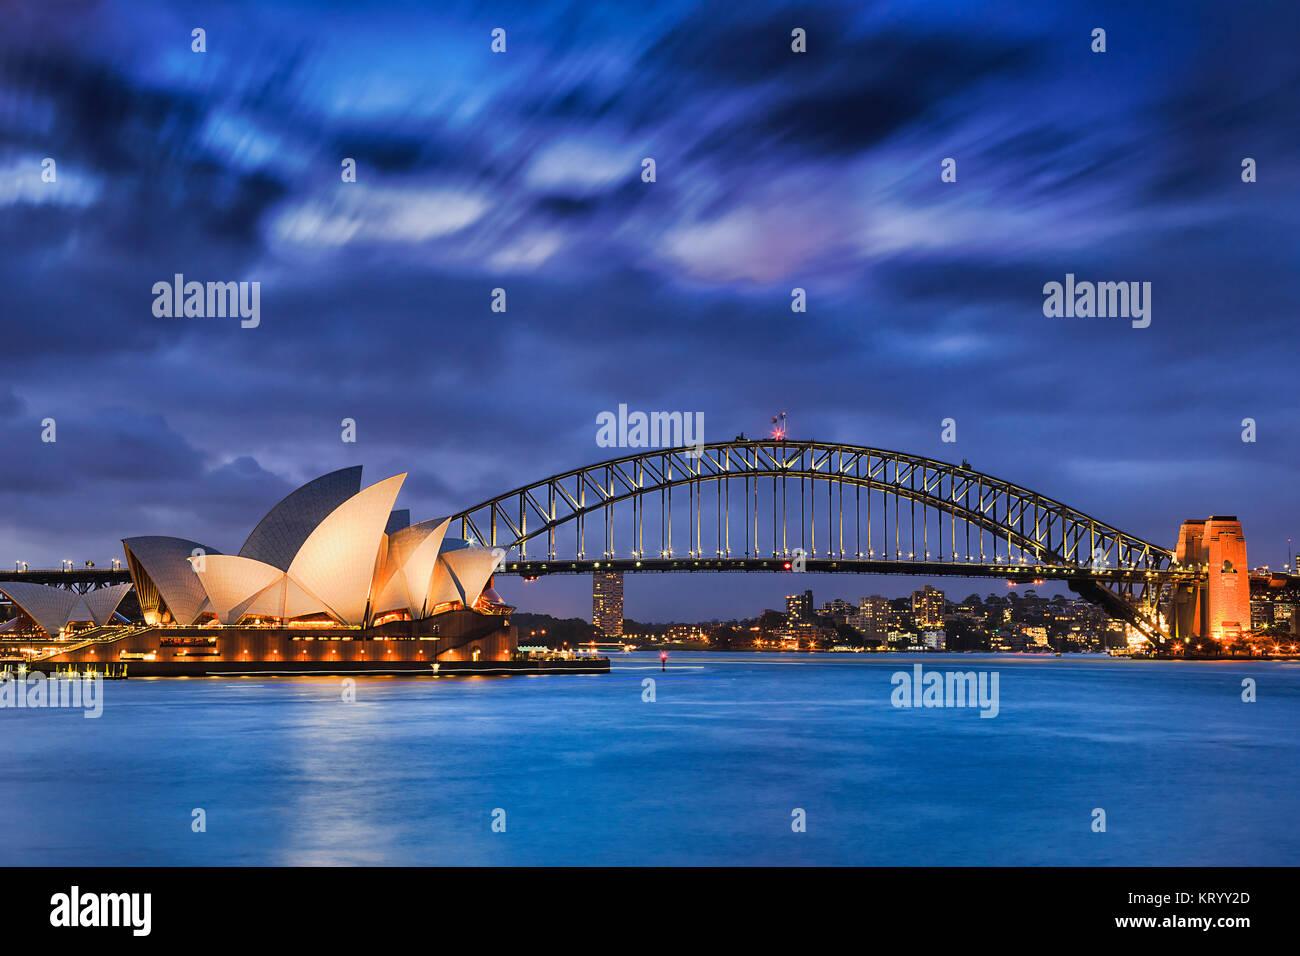 Sydney, Australia, 18 marzo 2017: famosa Sydney Opera House e Harbour Bridge al tramonto. Nuvole sfocata e luci Immagini Stock